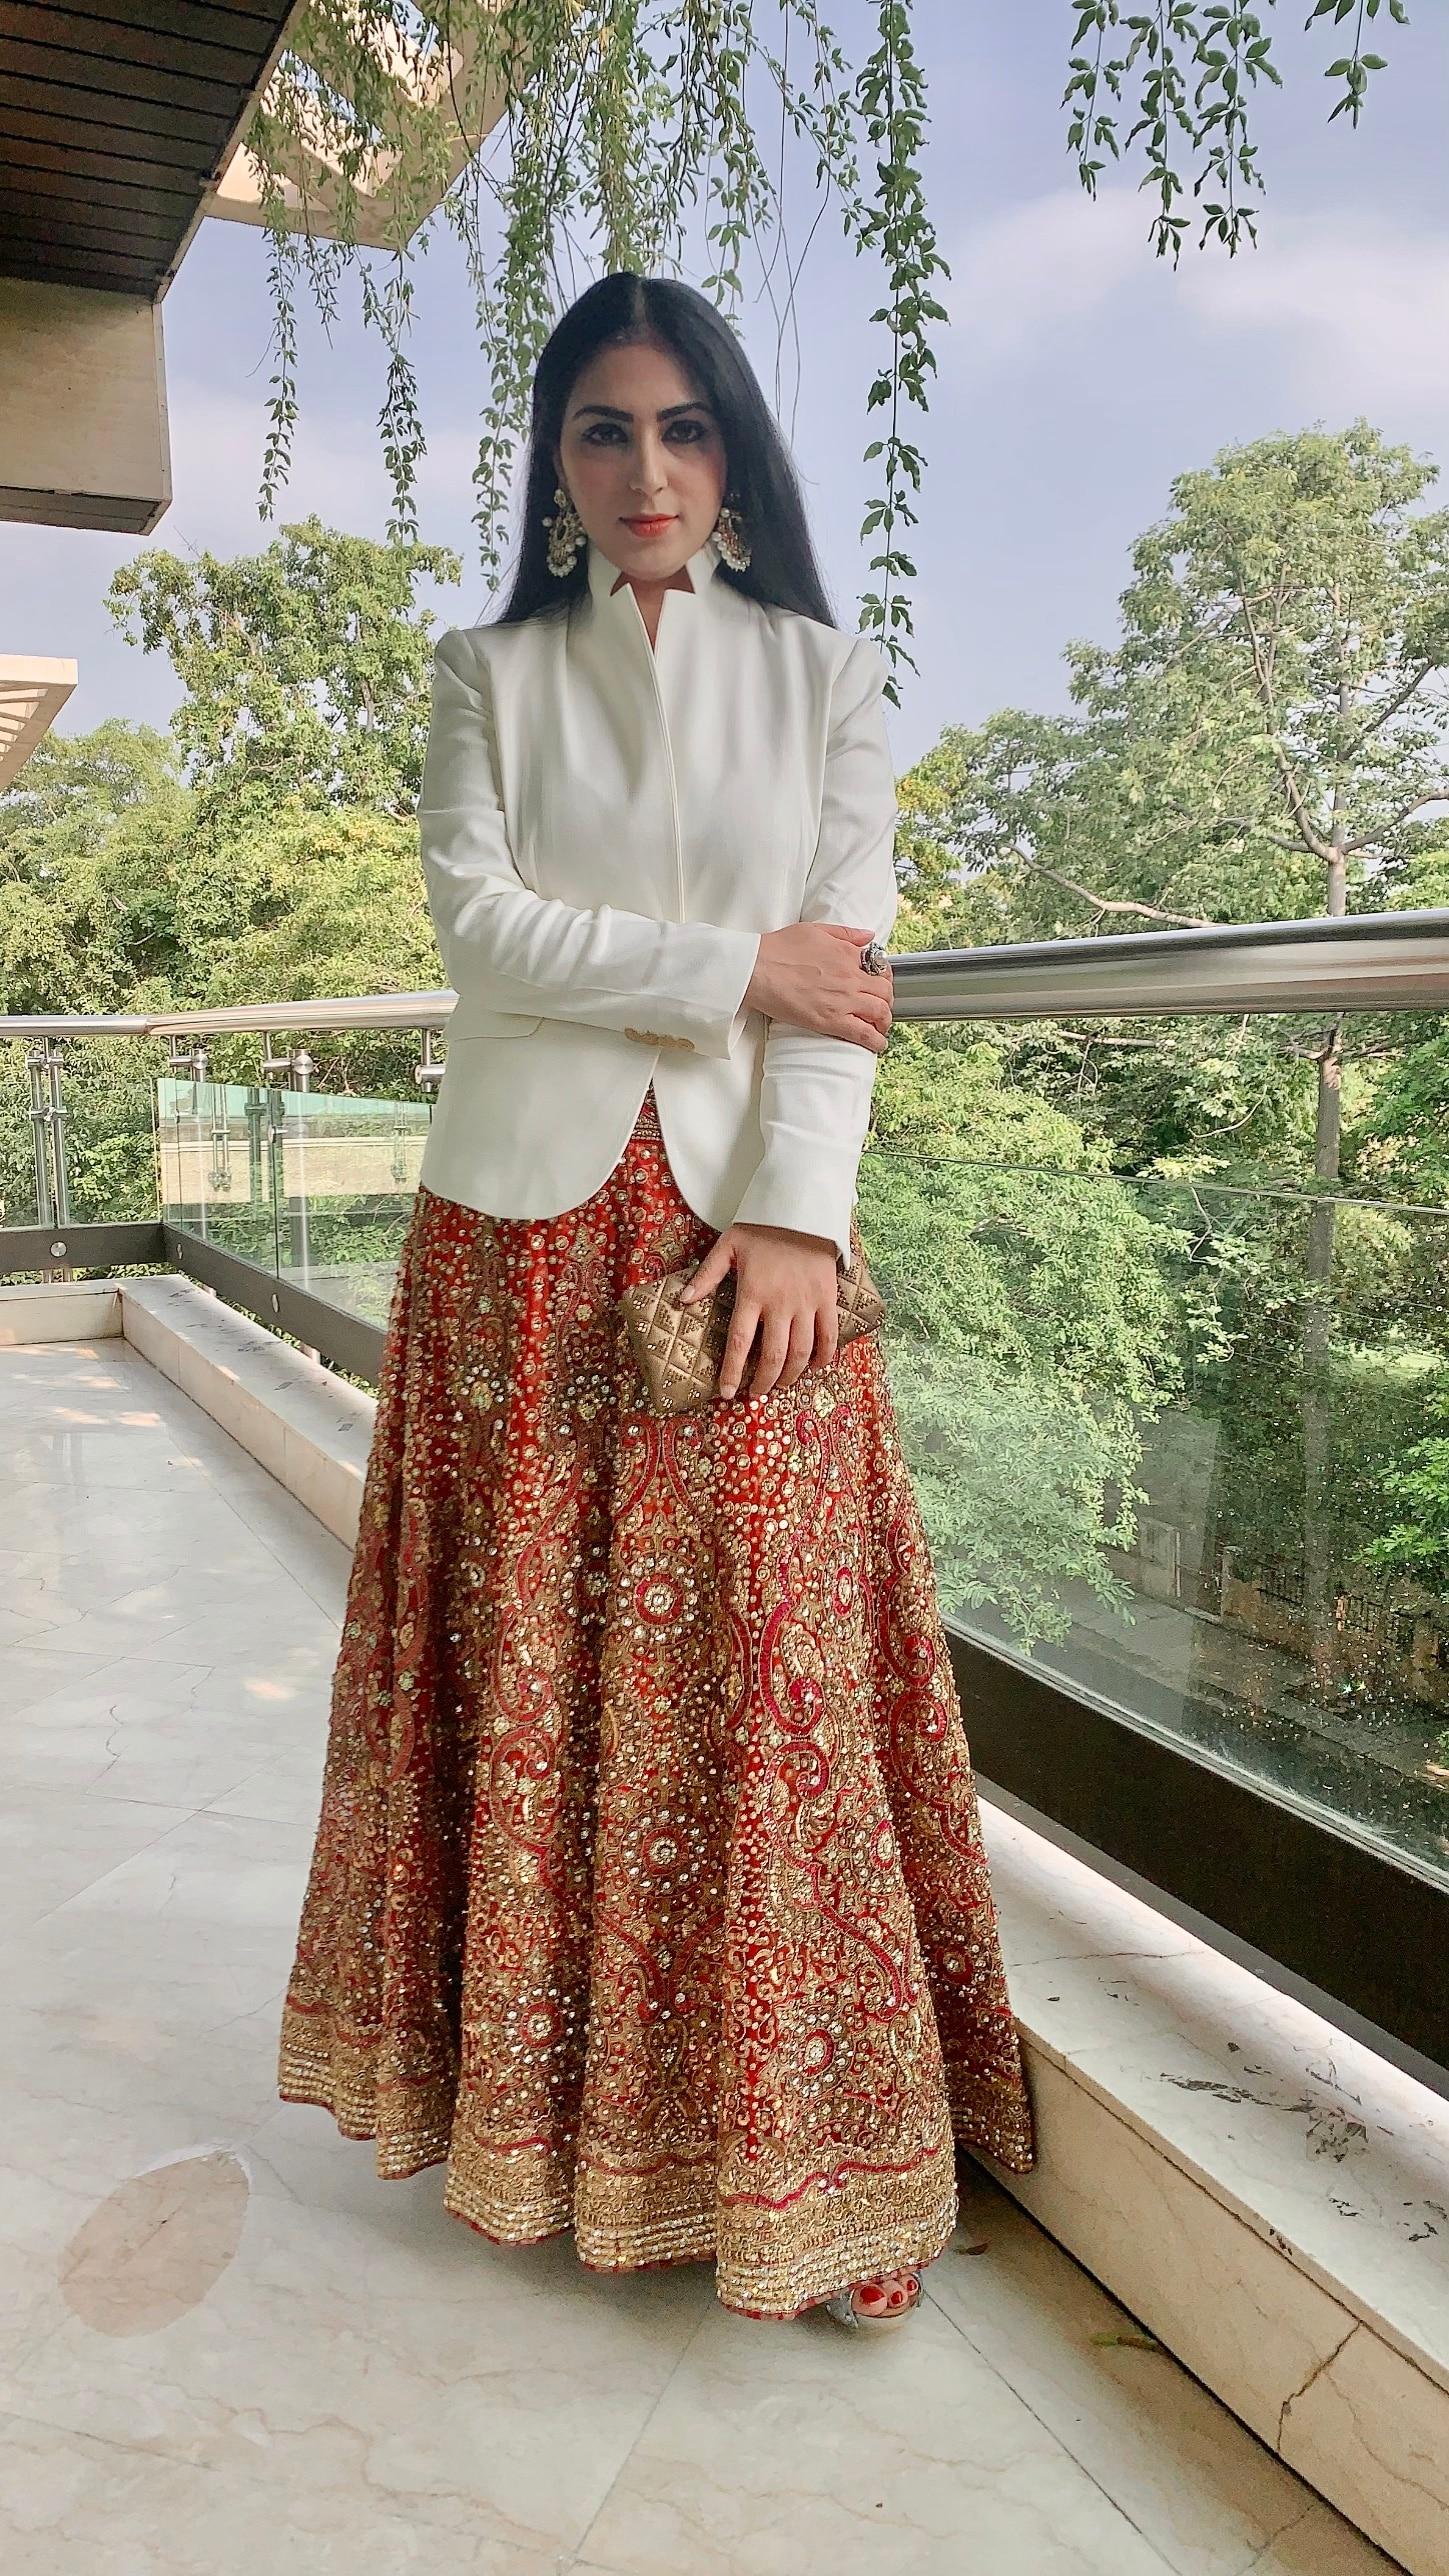 Surbhi, a Neeta Lulla Bride has re-styled her bridal lehenga